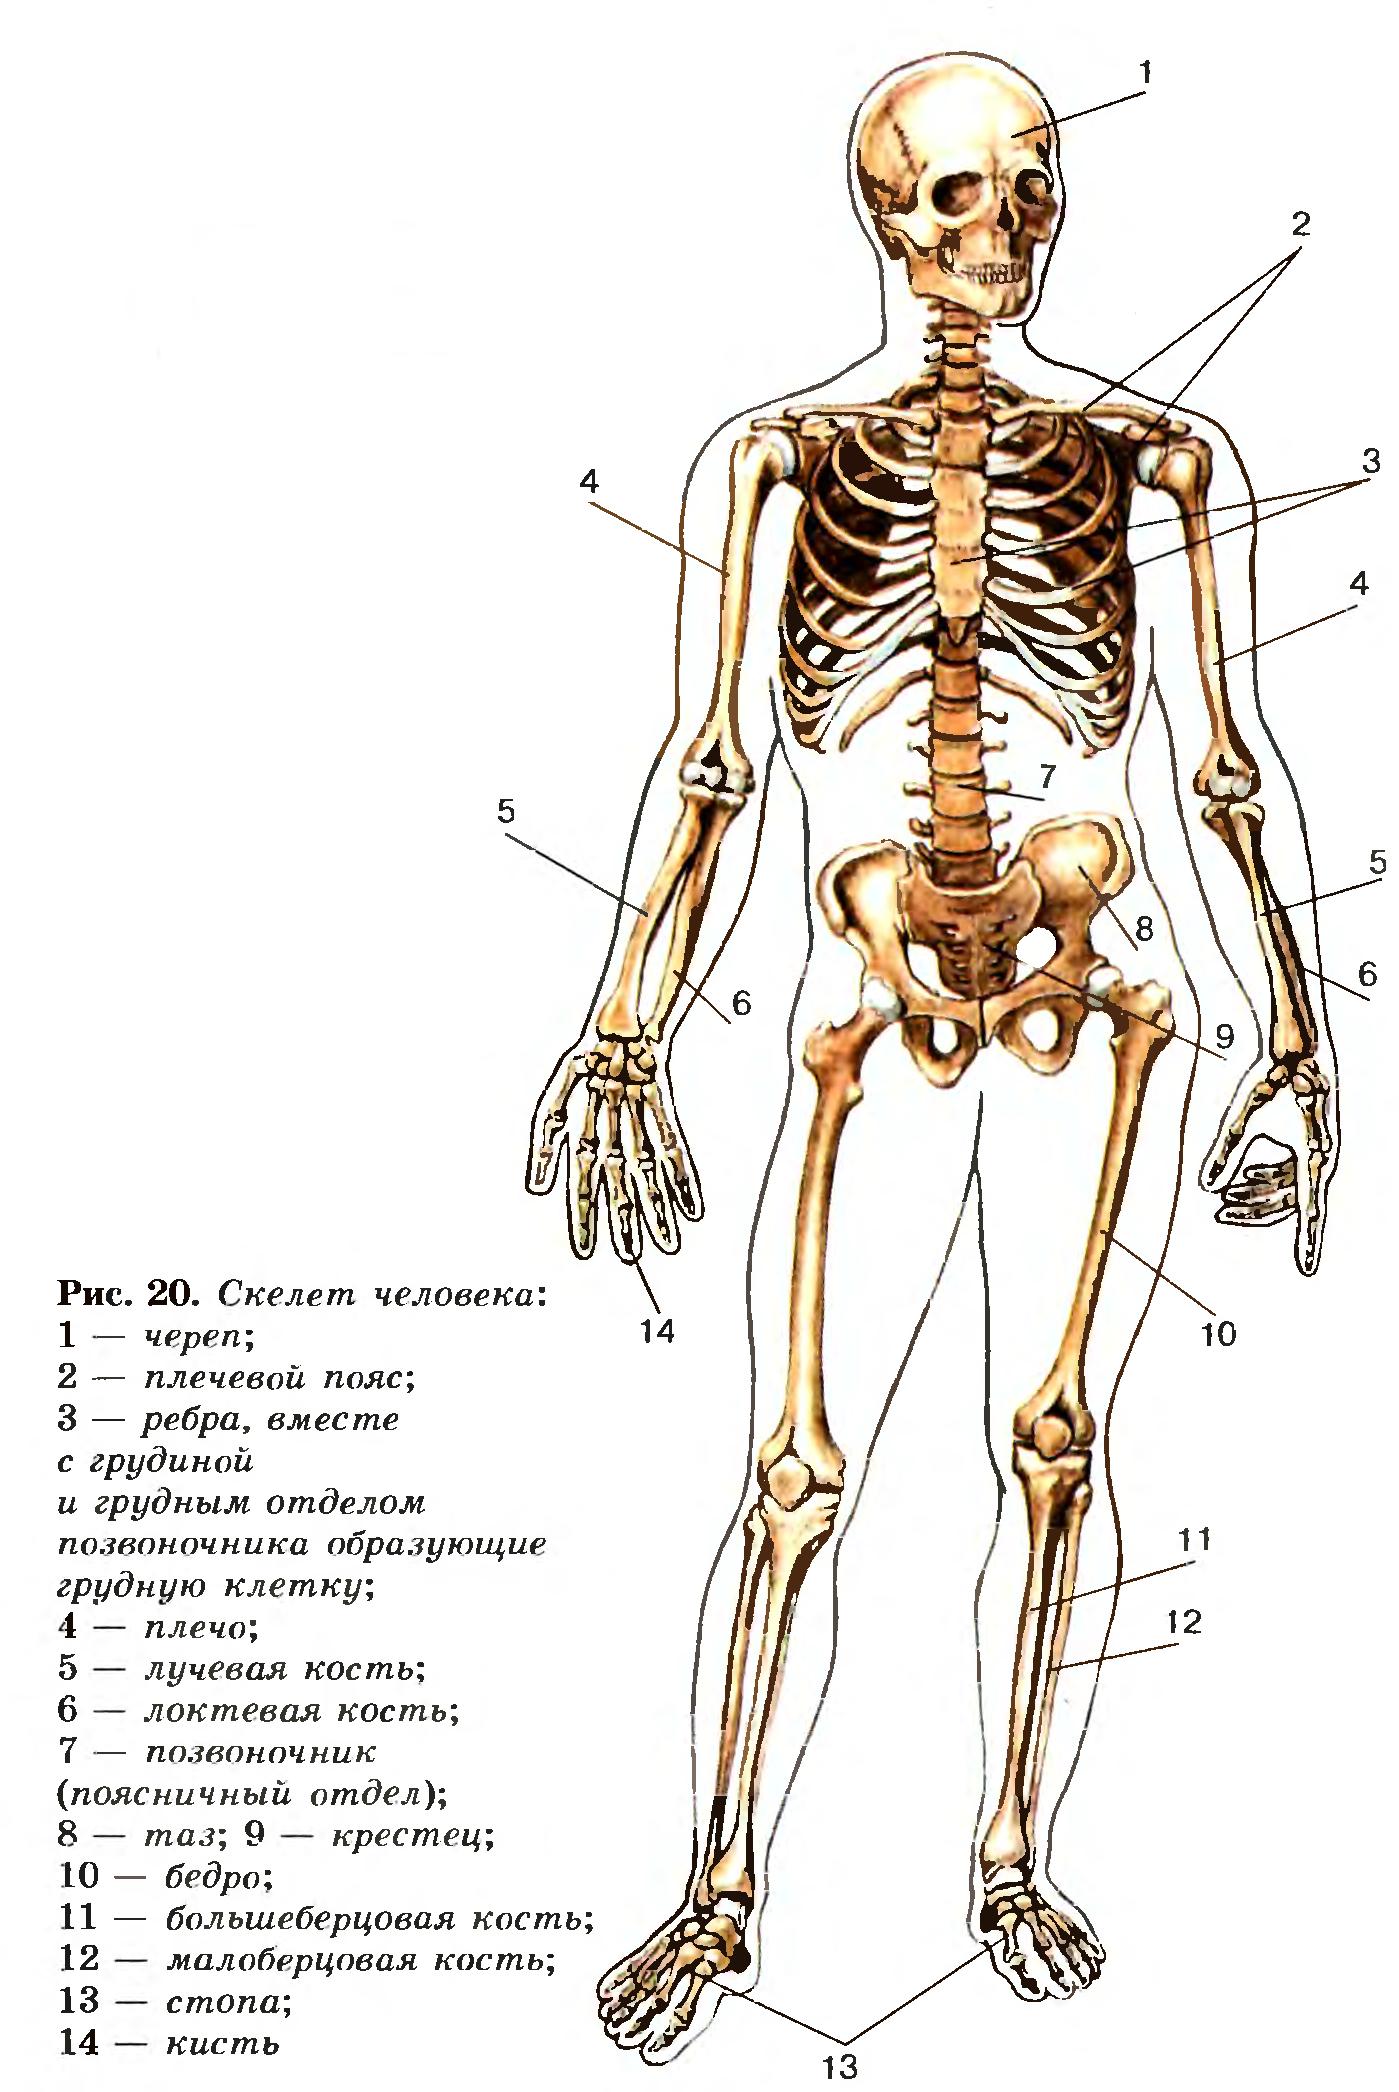 Реферат по скелету человека 4789